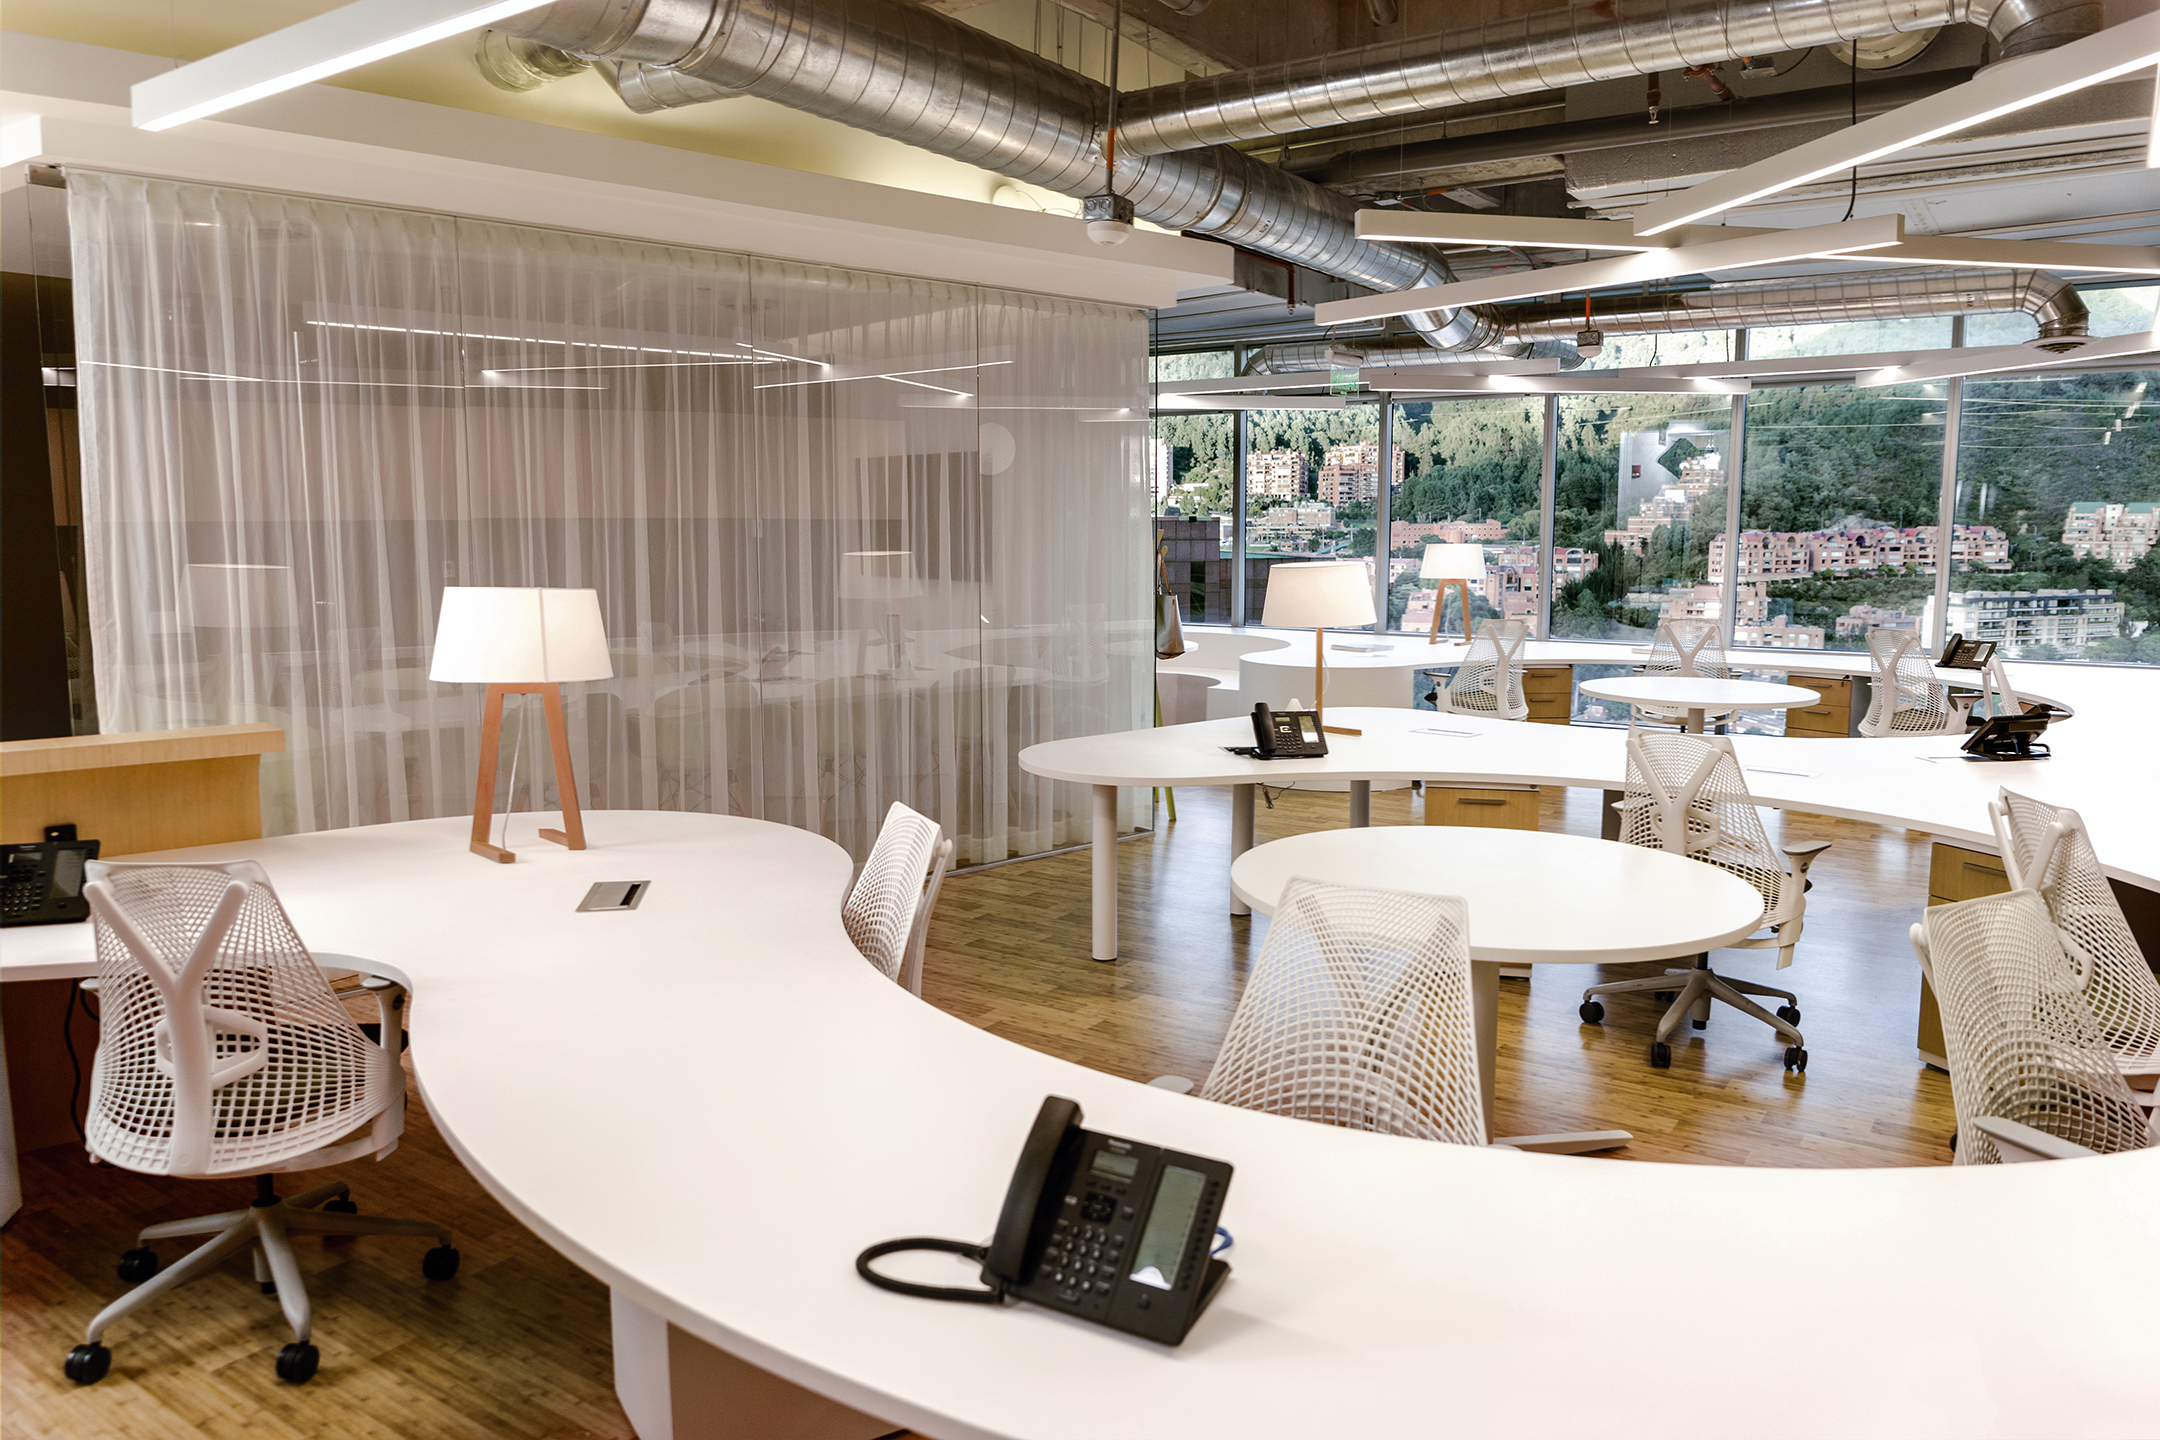 Contract Workplaces - Revista Clave!